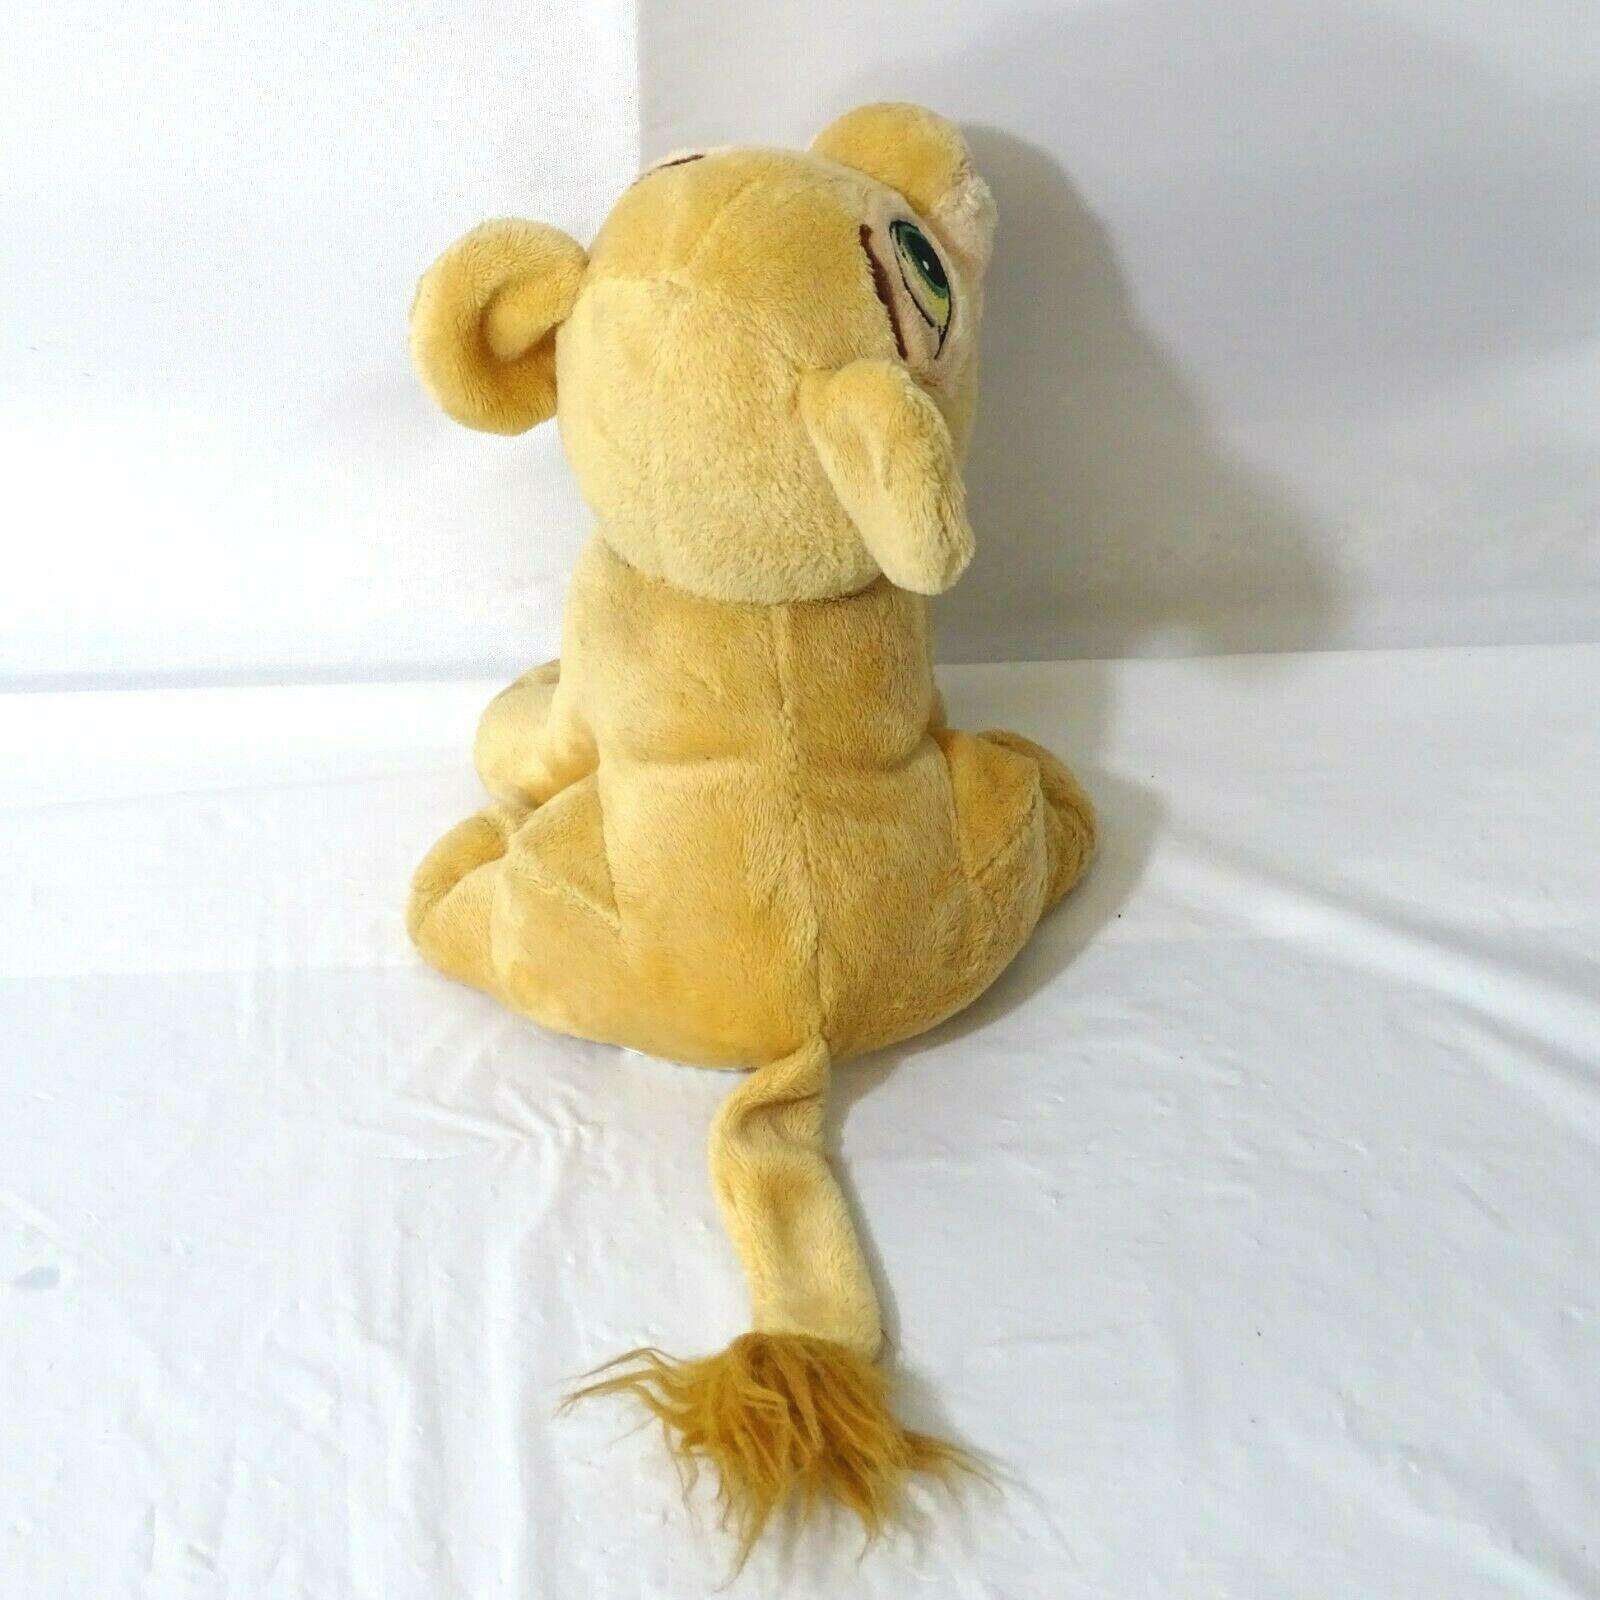 Disney Lion King Nala Cub Stuffed Plush Toy Tan 8 inch image 2